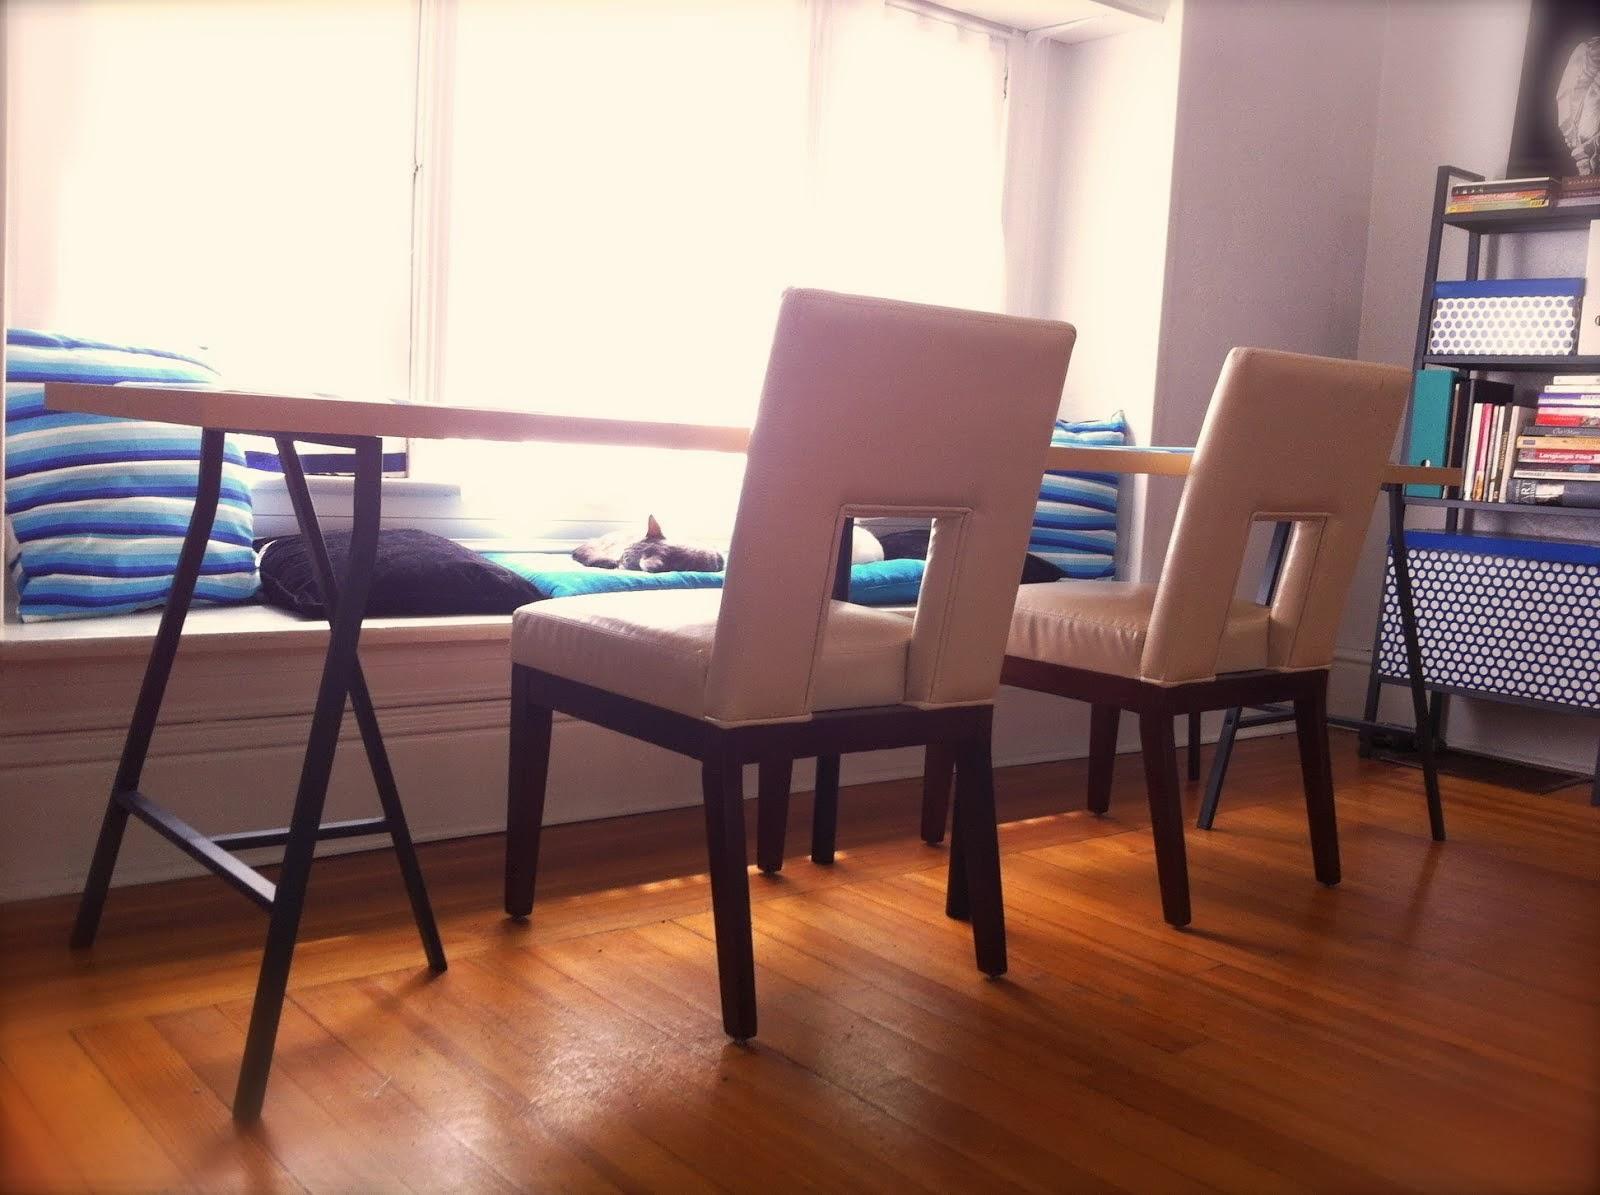 LINNMON And LERBERG, A Long And Narrow Dining Table